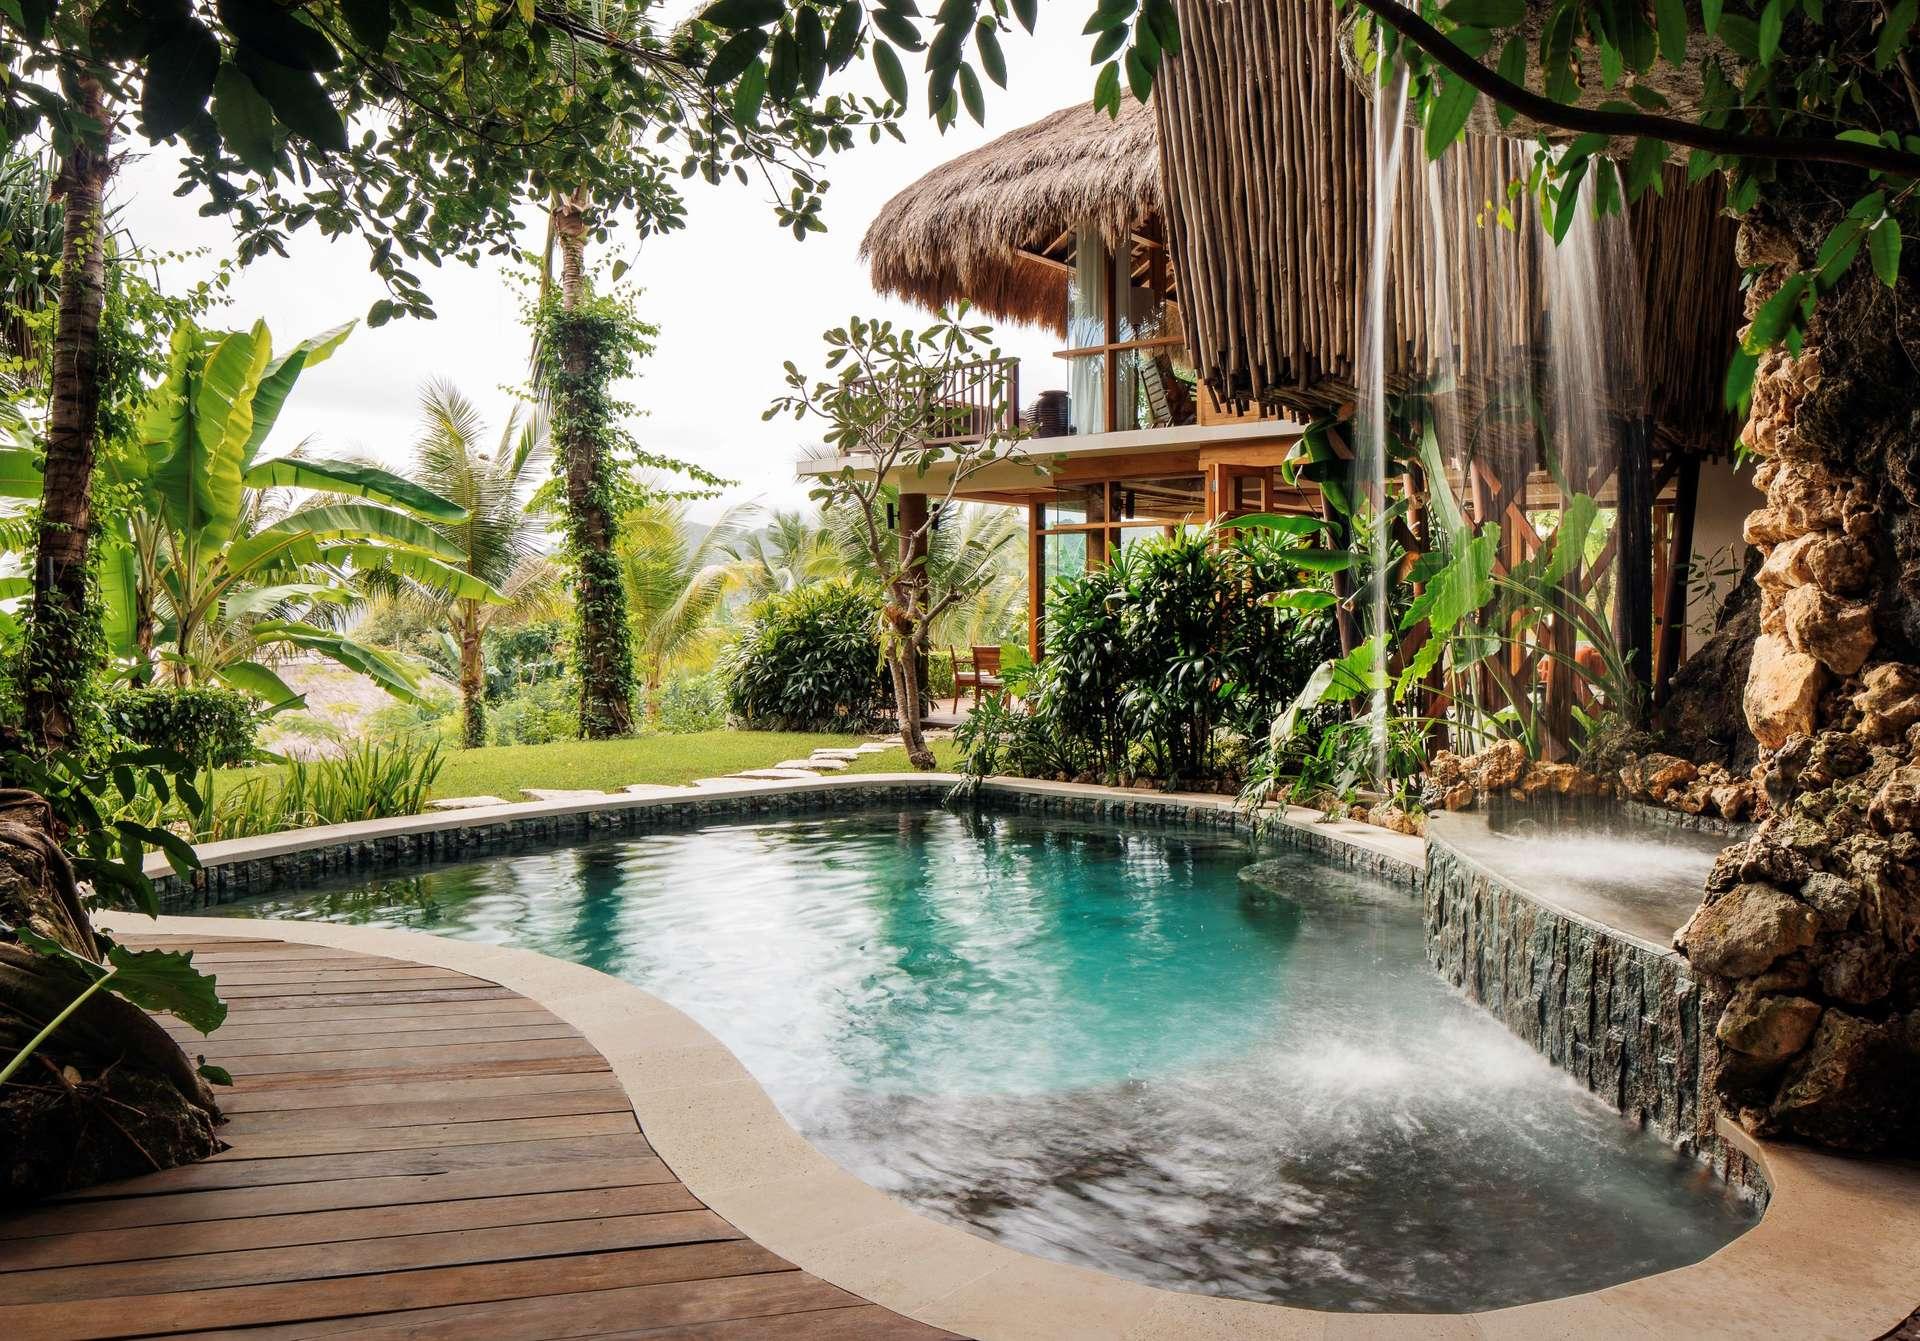 Luxury villa rentals asia - Indonesia - Sumba - Nihi sumba - Mandaka Duplex Villas - Image 1/14